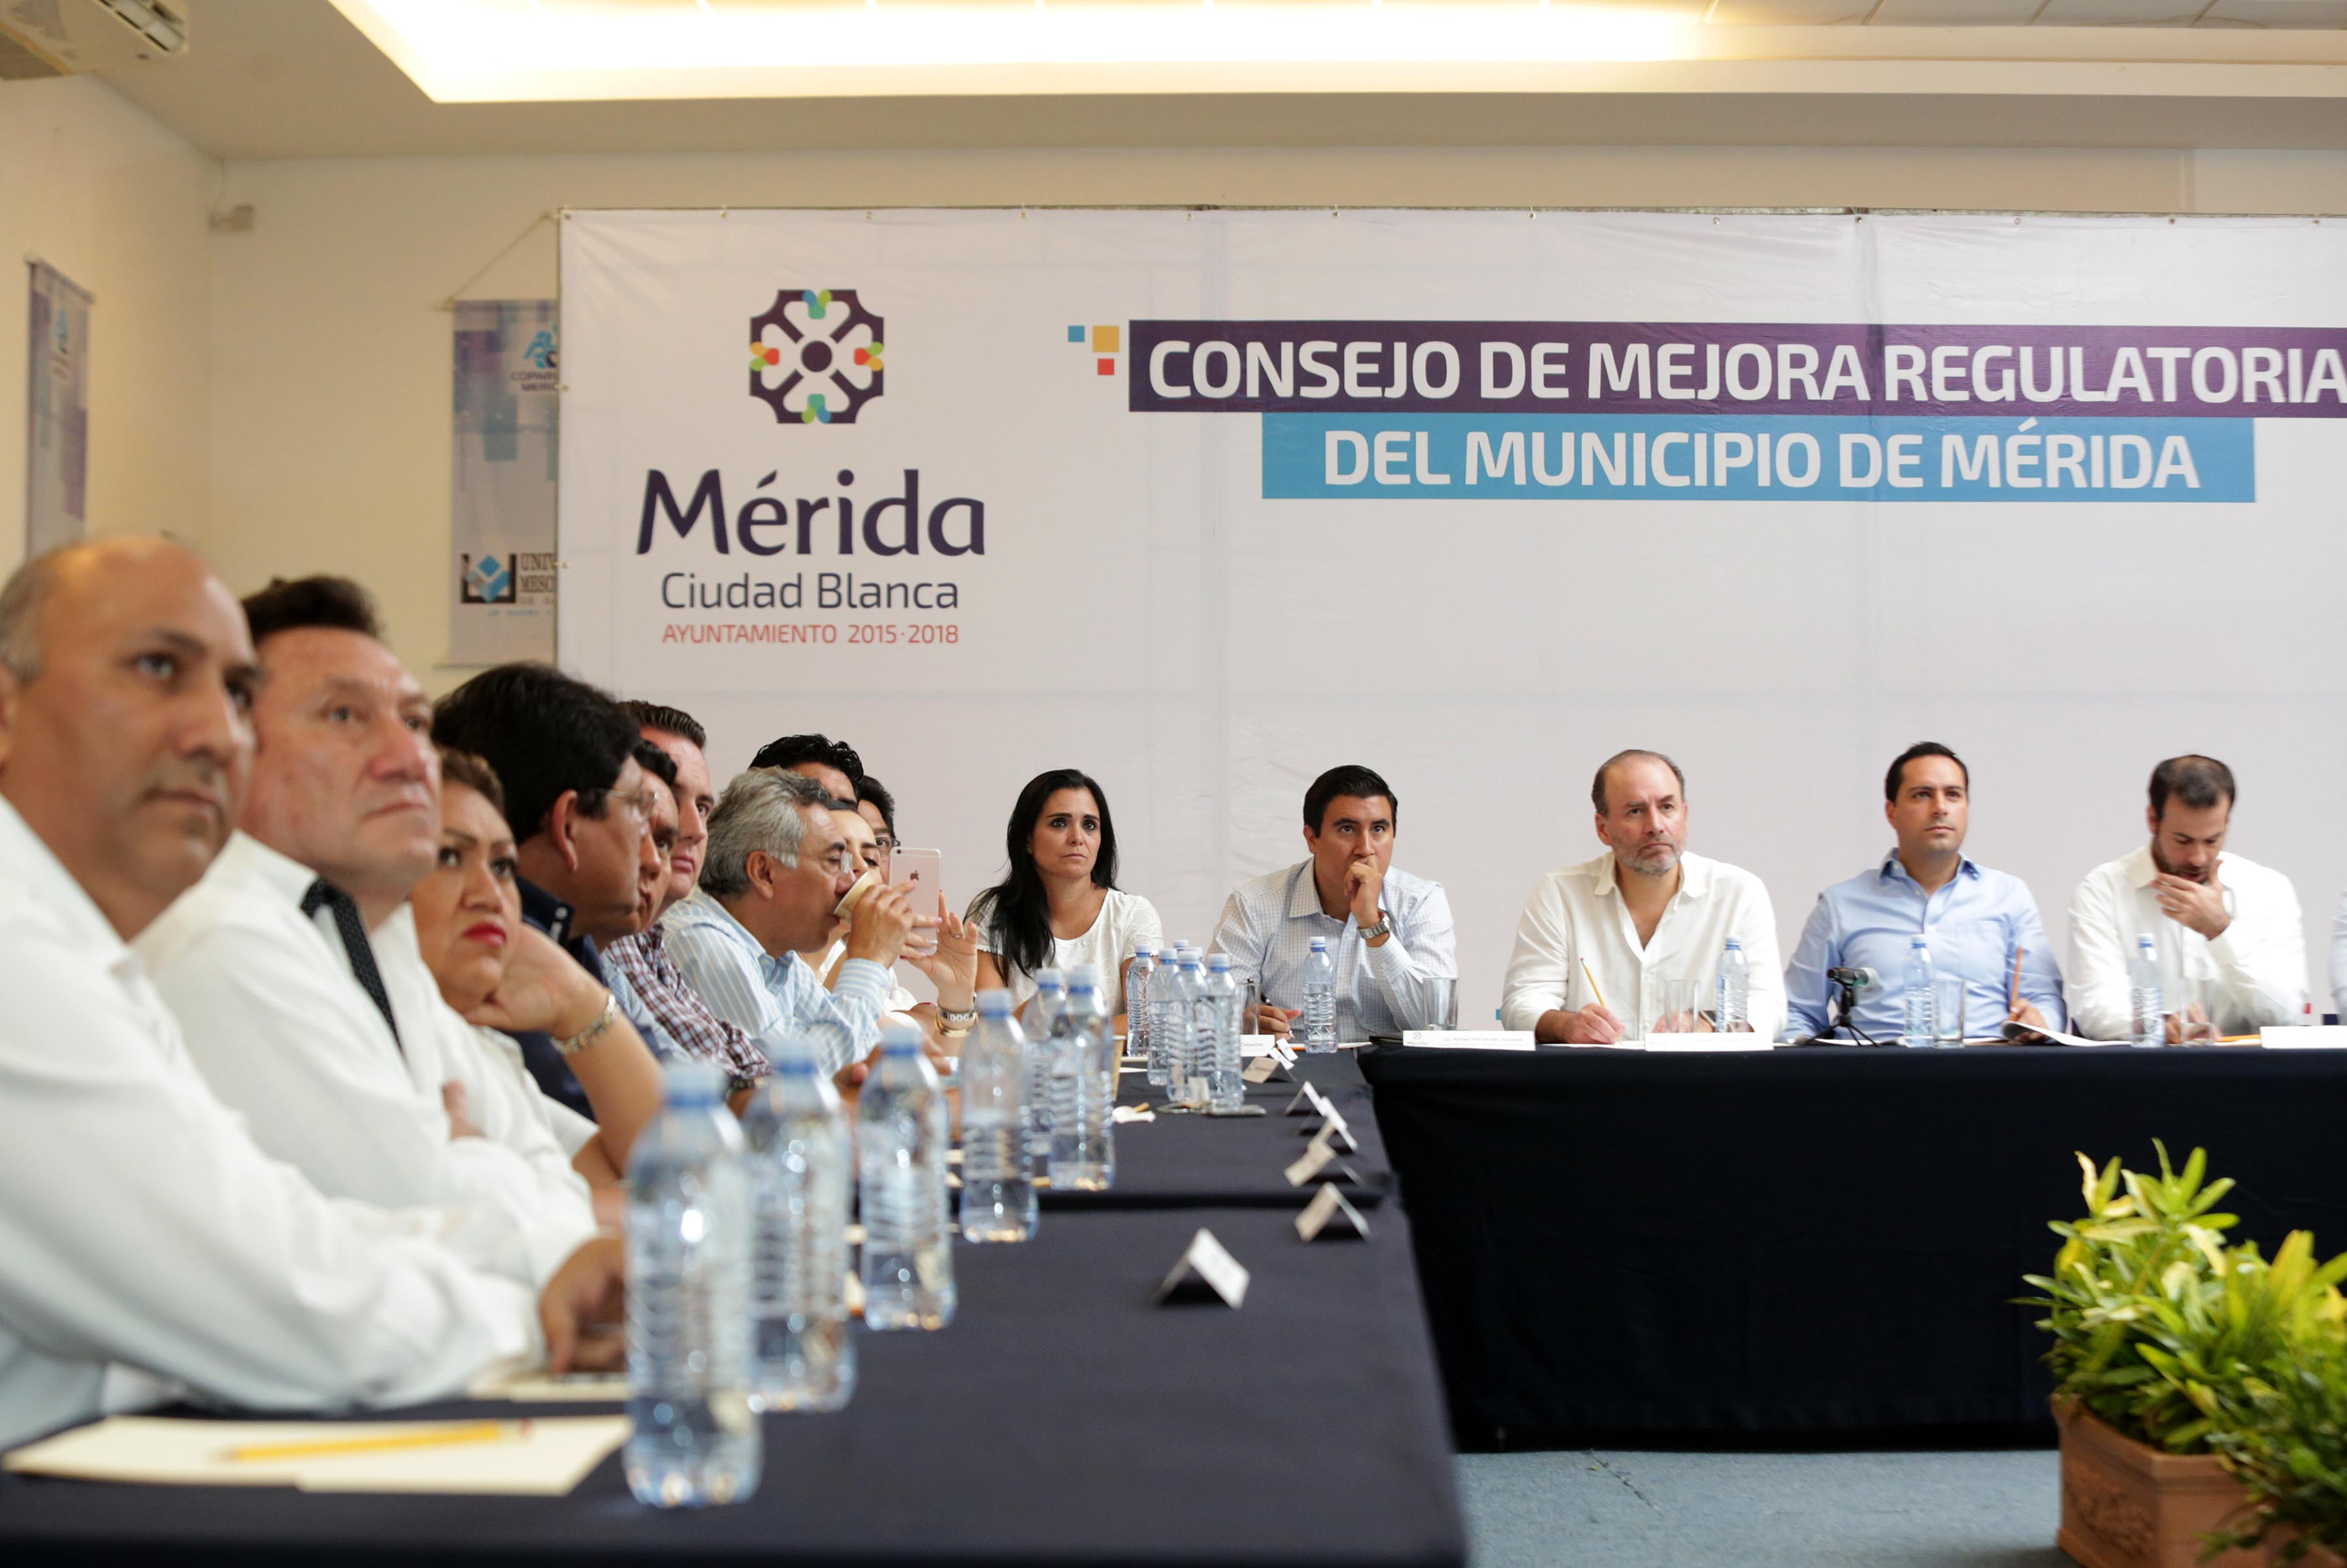 Instalan en Mérida Consejo de Mejora Regulatoria